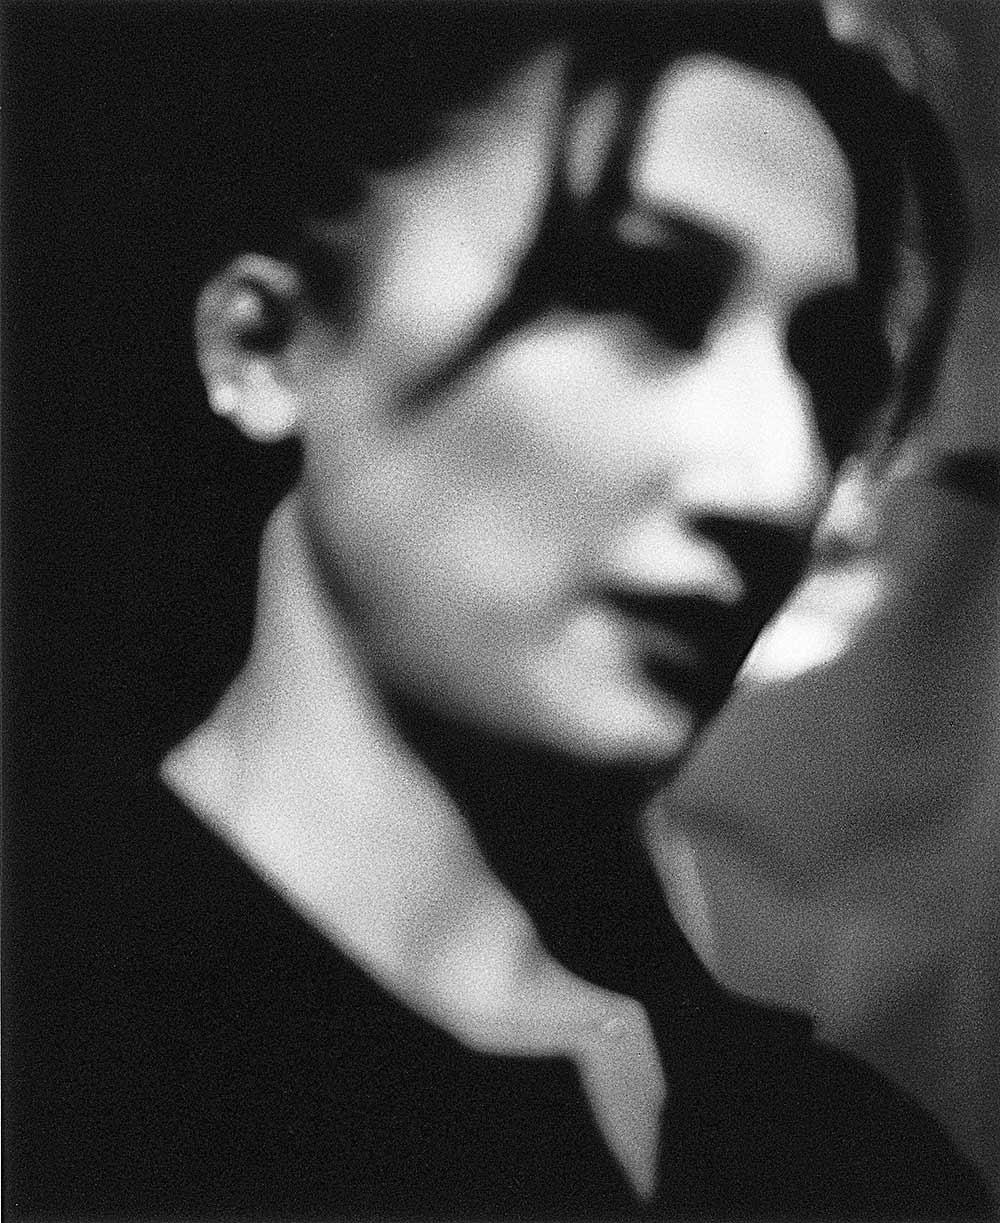 CIRCUS LIFE - Everynight, all around the world - Ingrid Around Italy, 1999